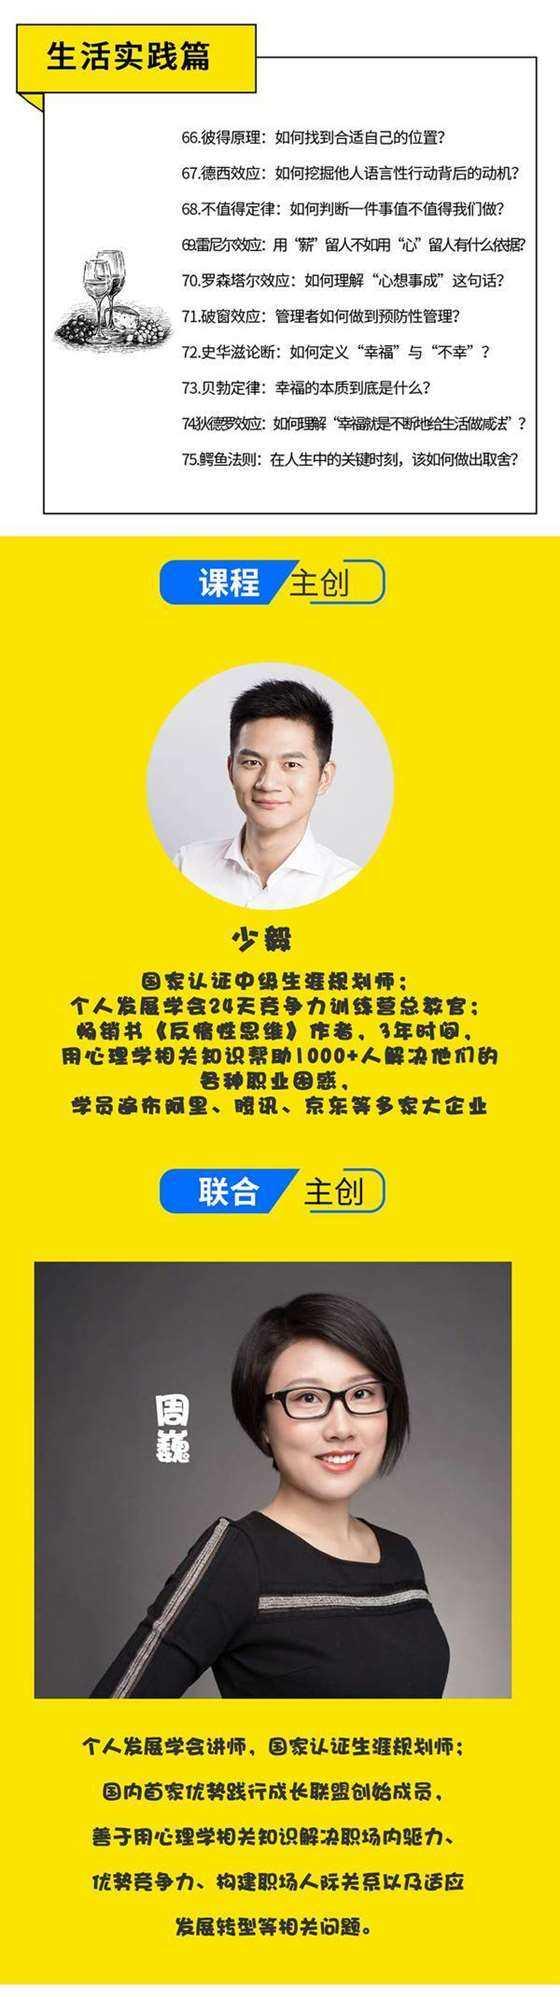 http://www.huodongxing.com/file/20160530/5092341960349/623192170877659.jpeg